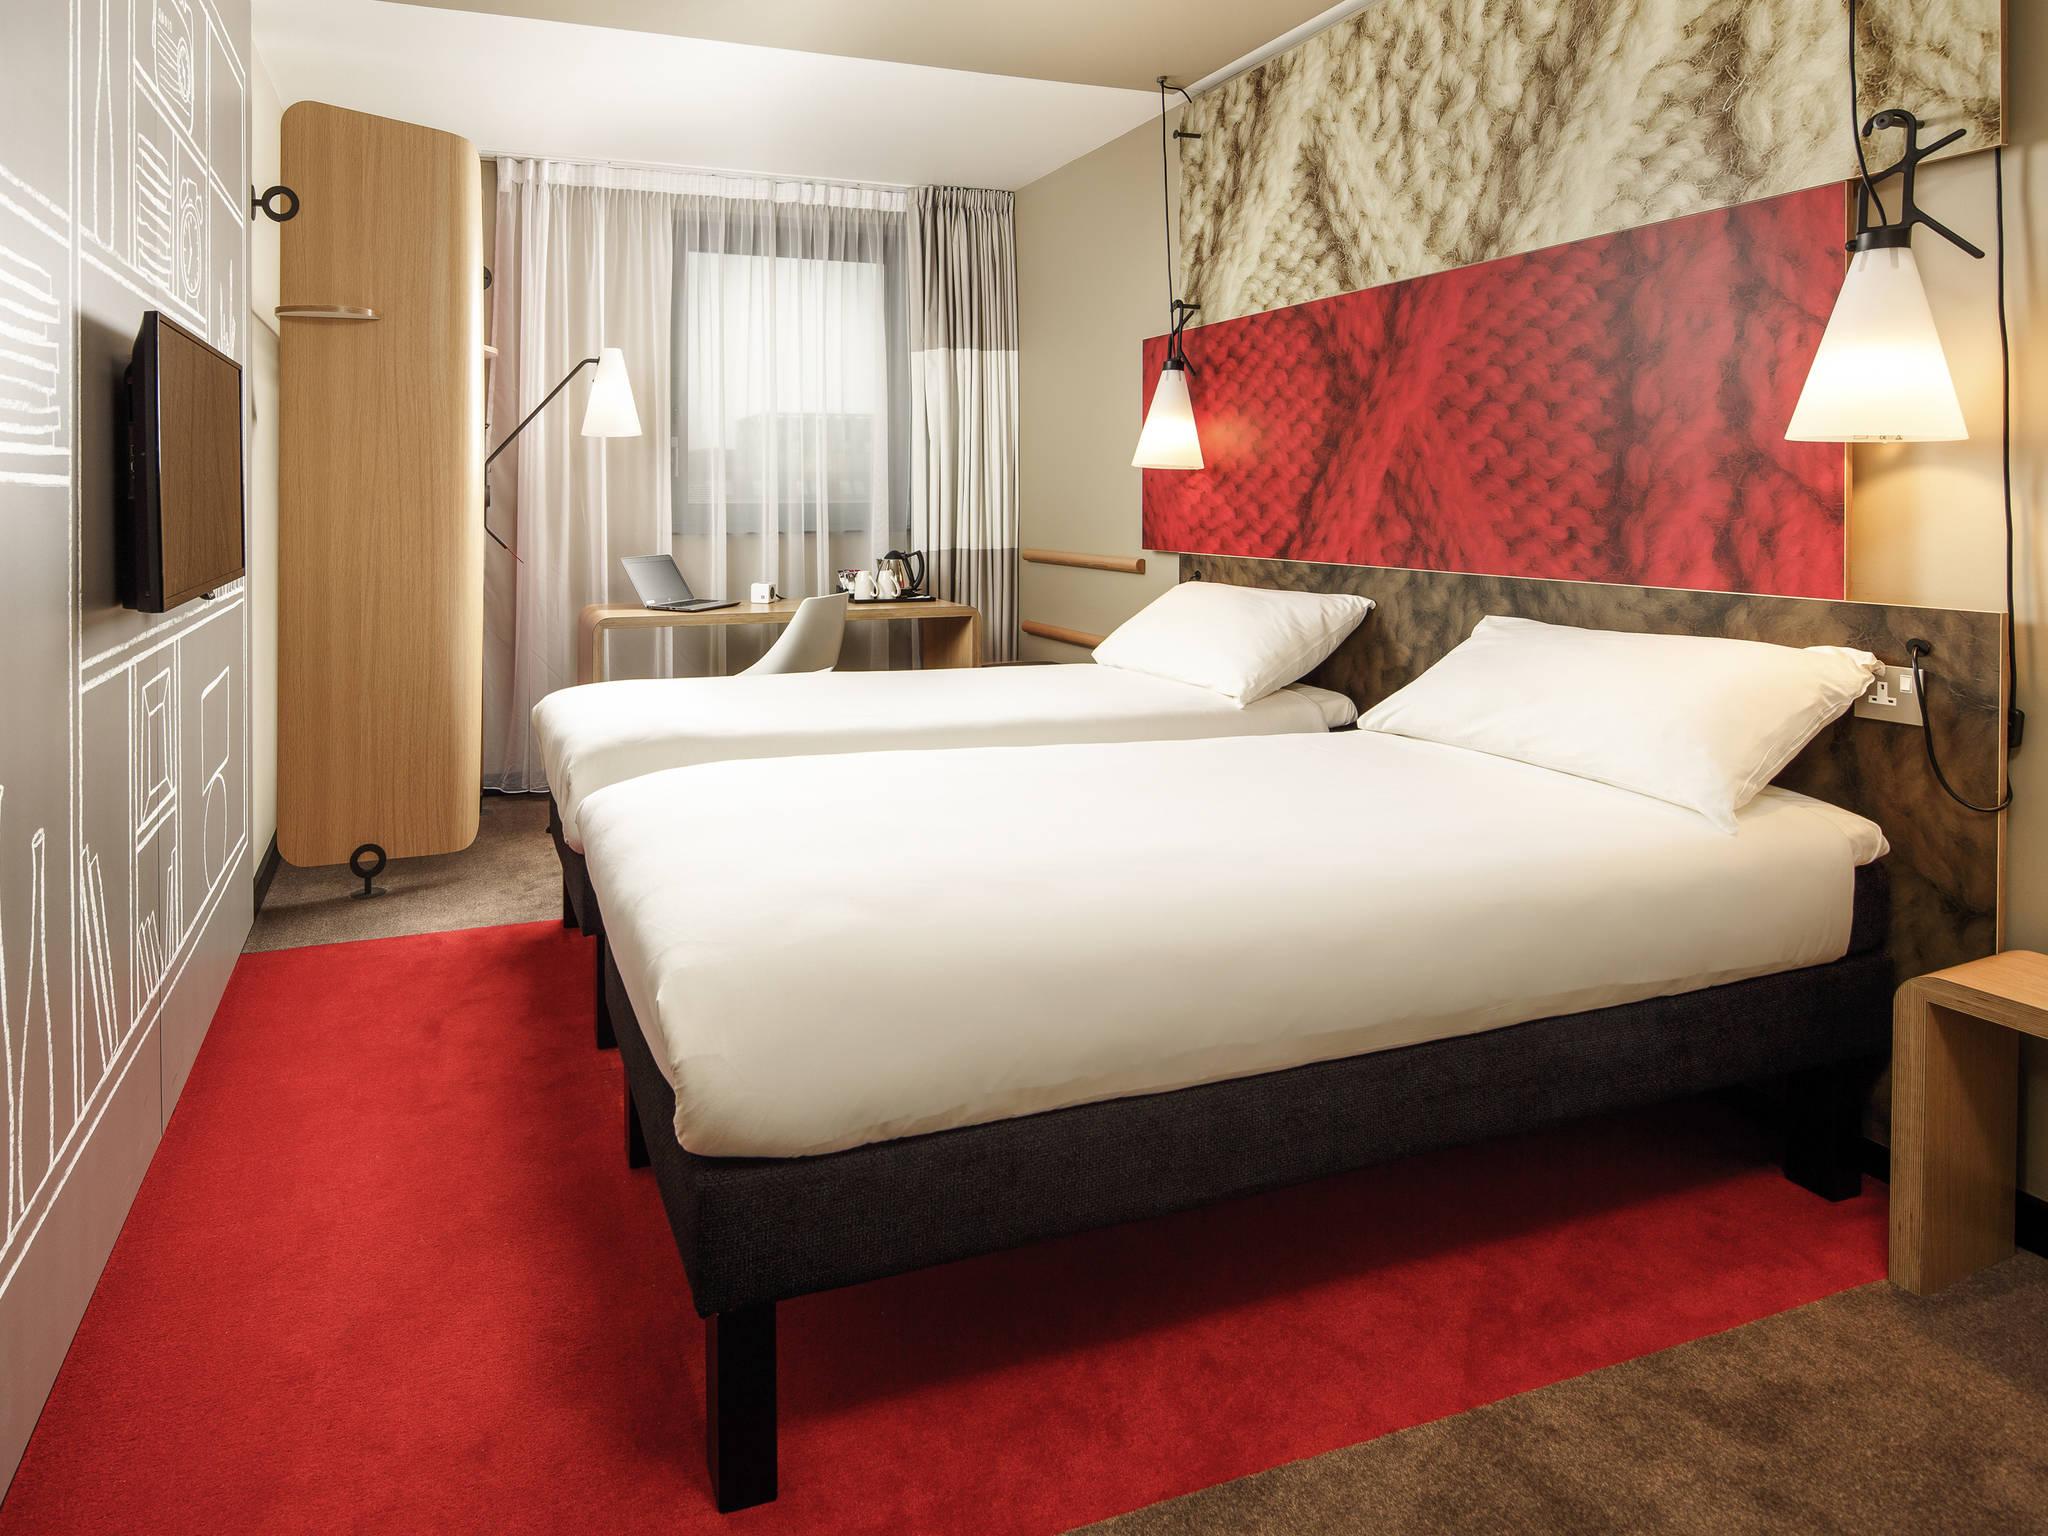 Hotel em londres ibis londres excel docklands for Hotel adagio londres